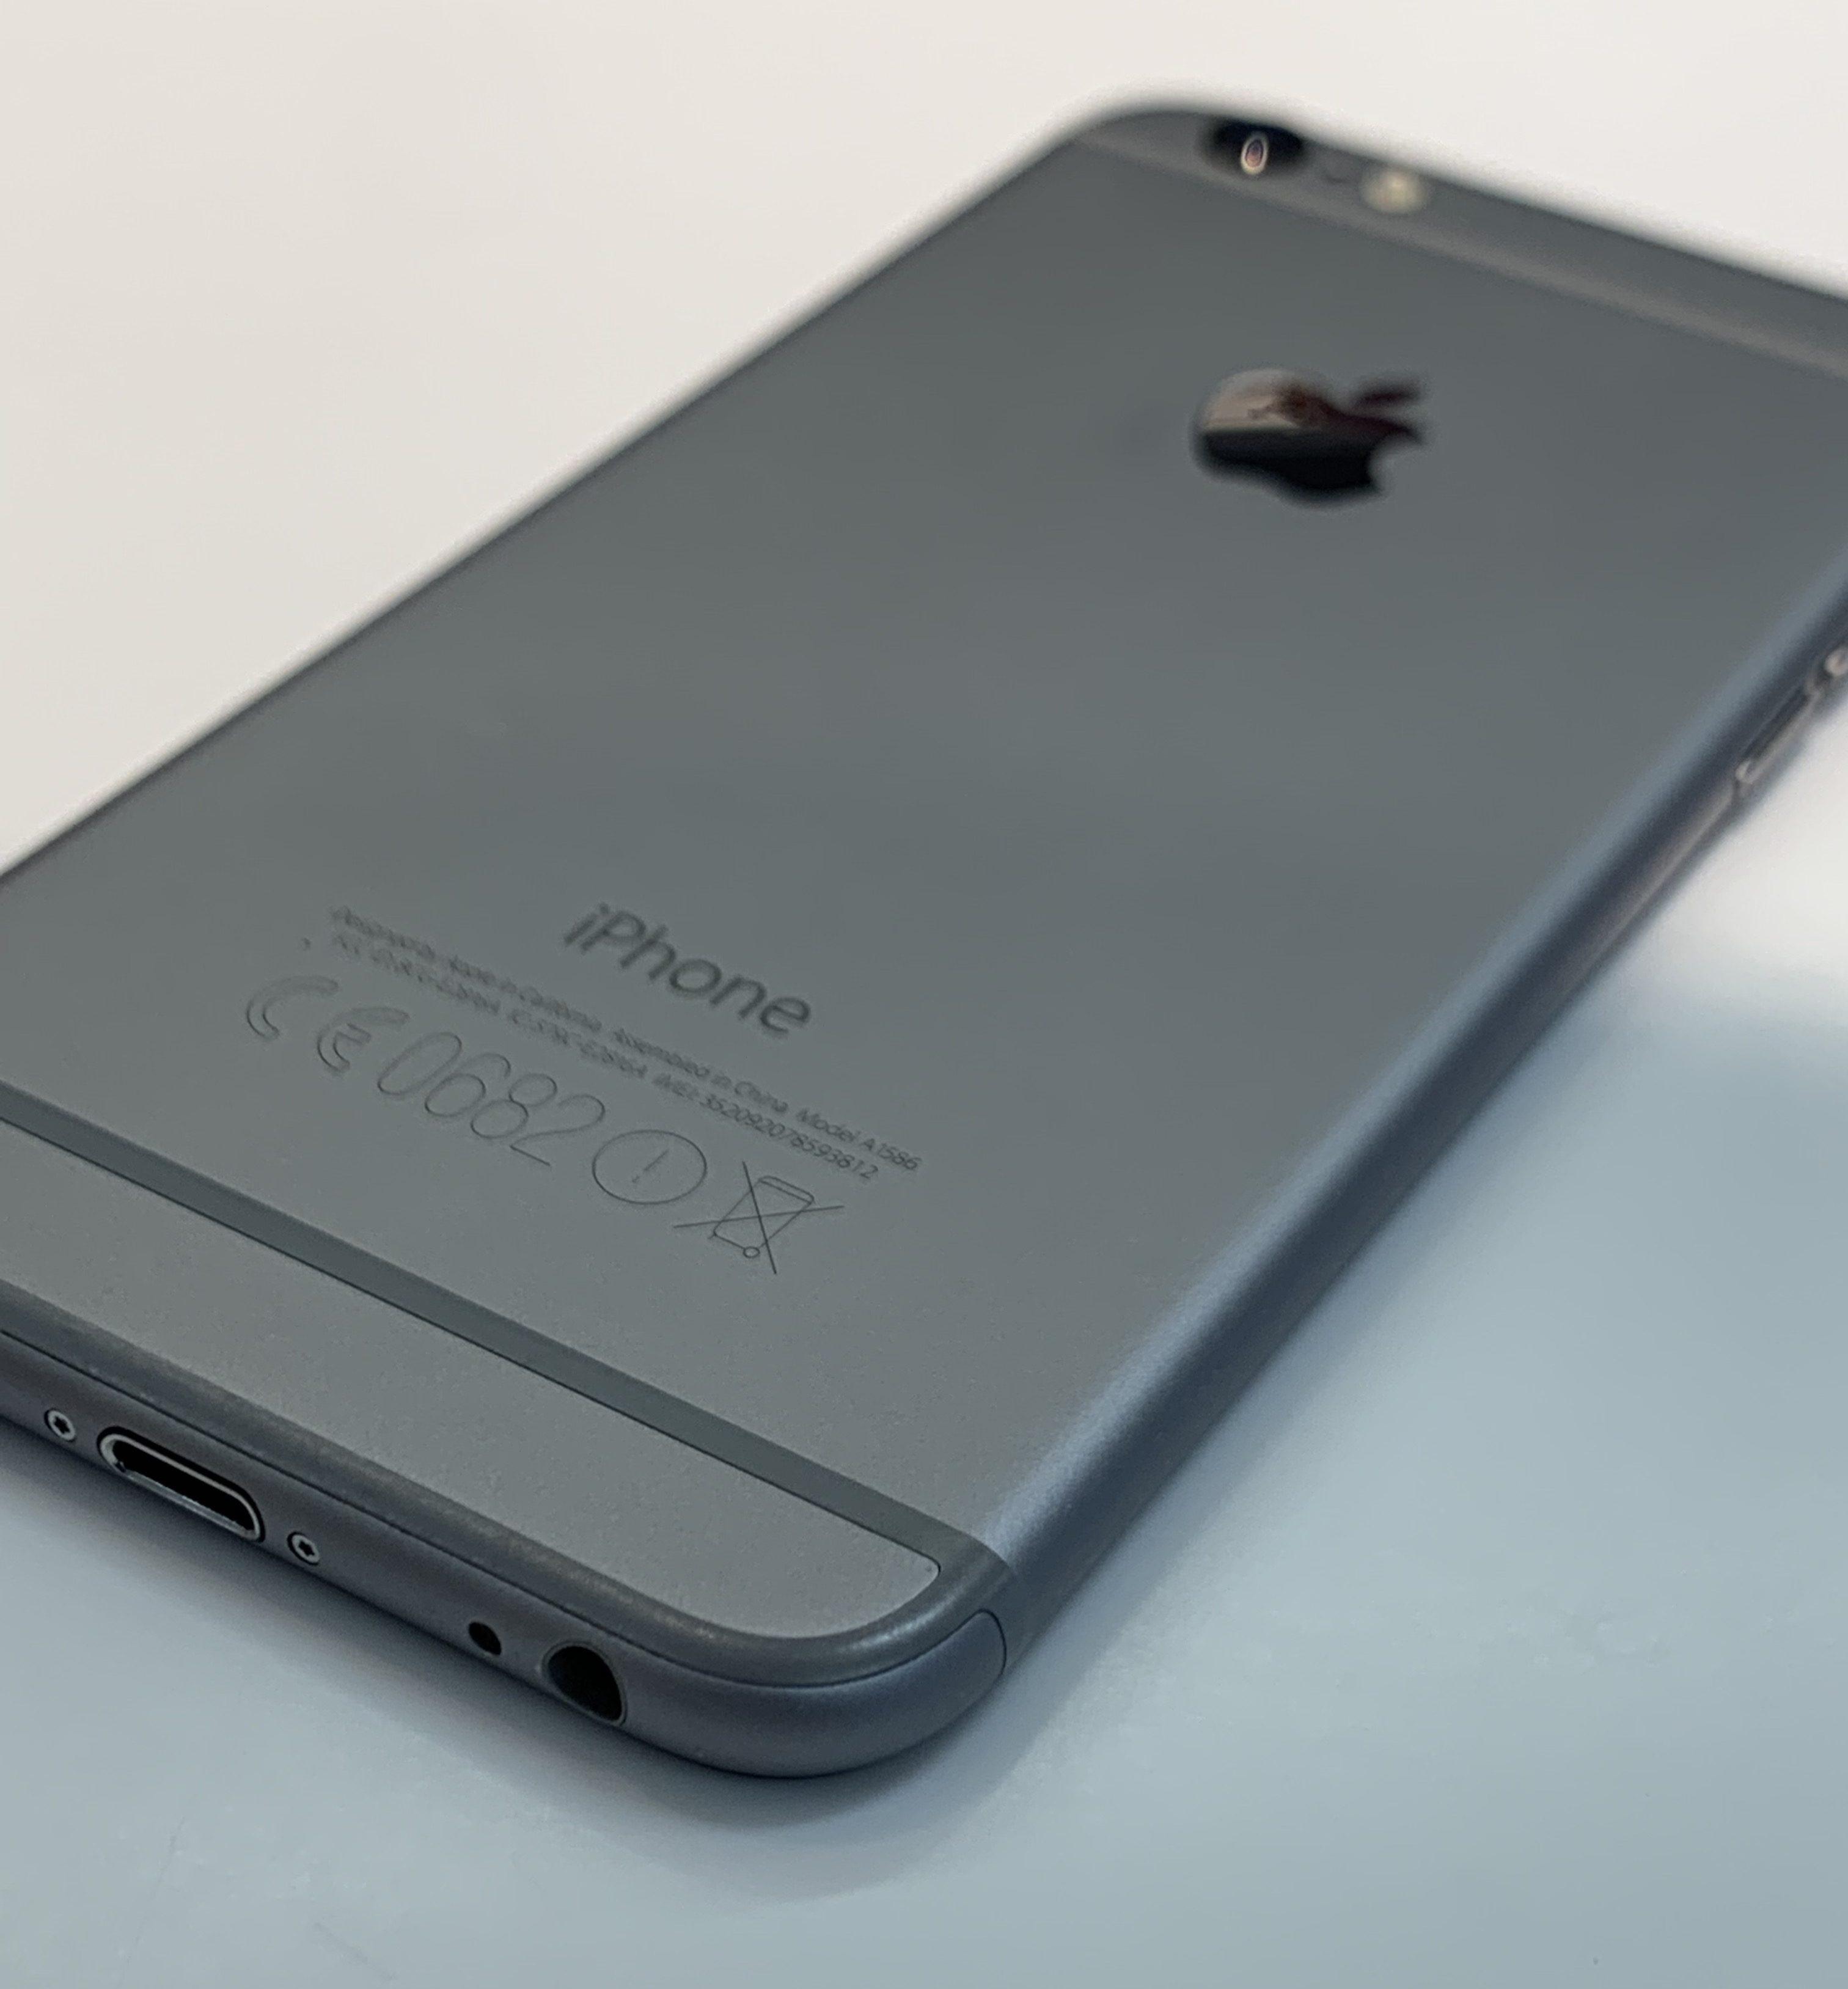 iPhone 6 16GB, 16 GB, Space Gray, bild 4